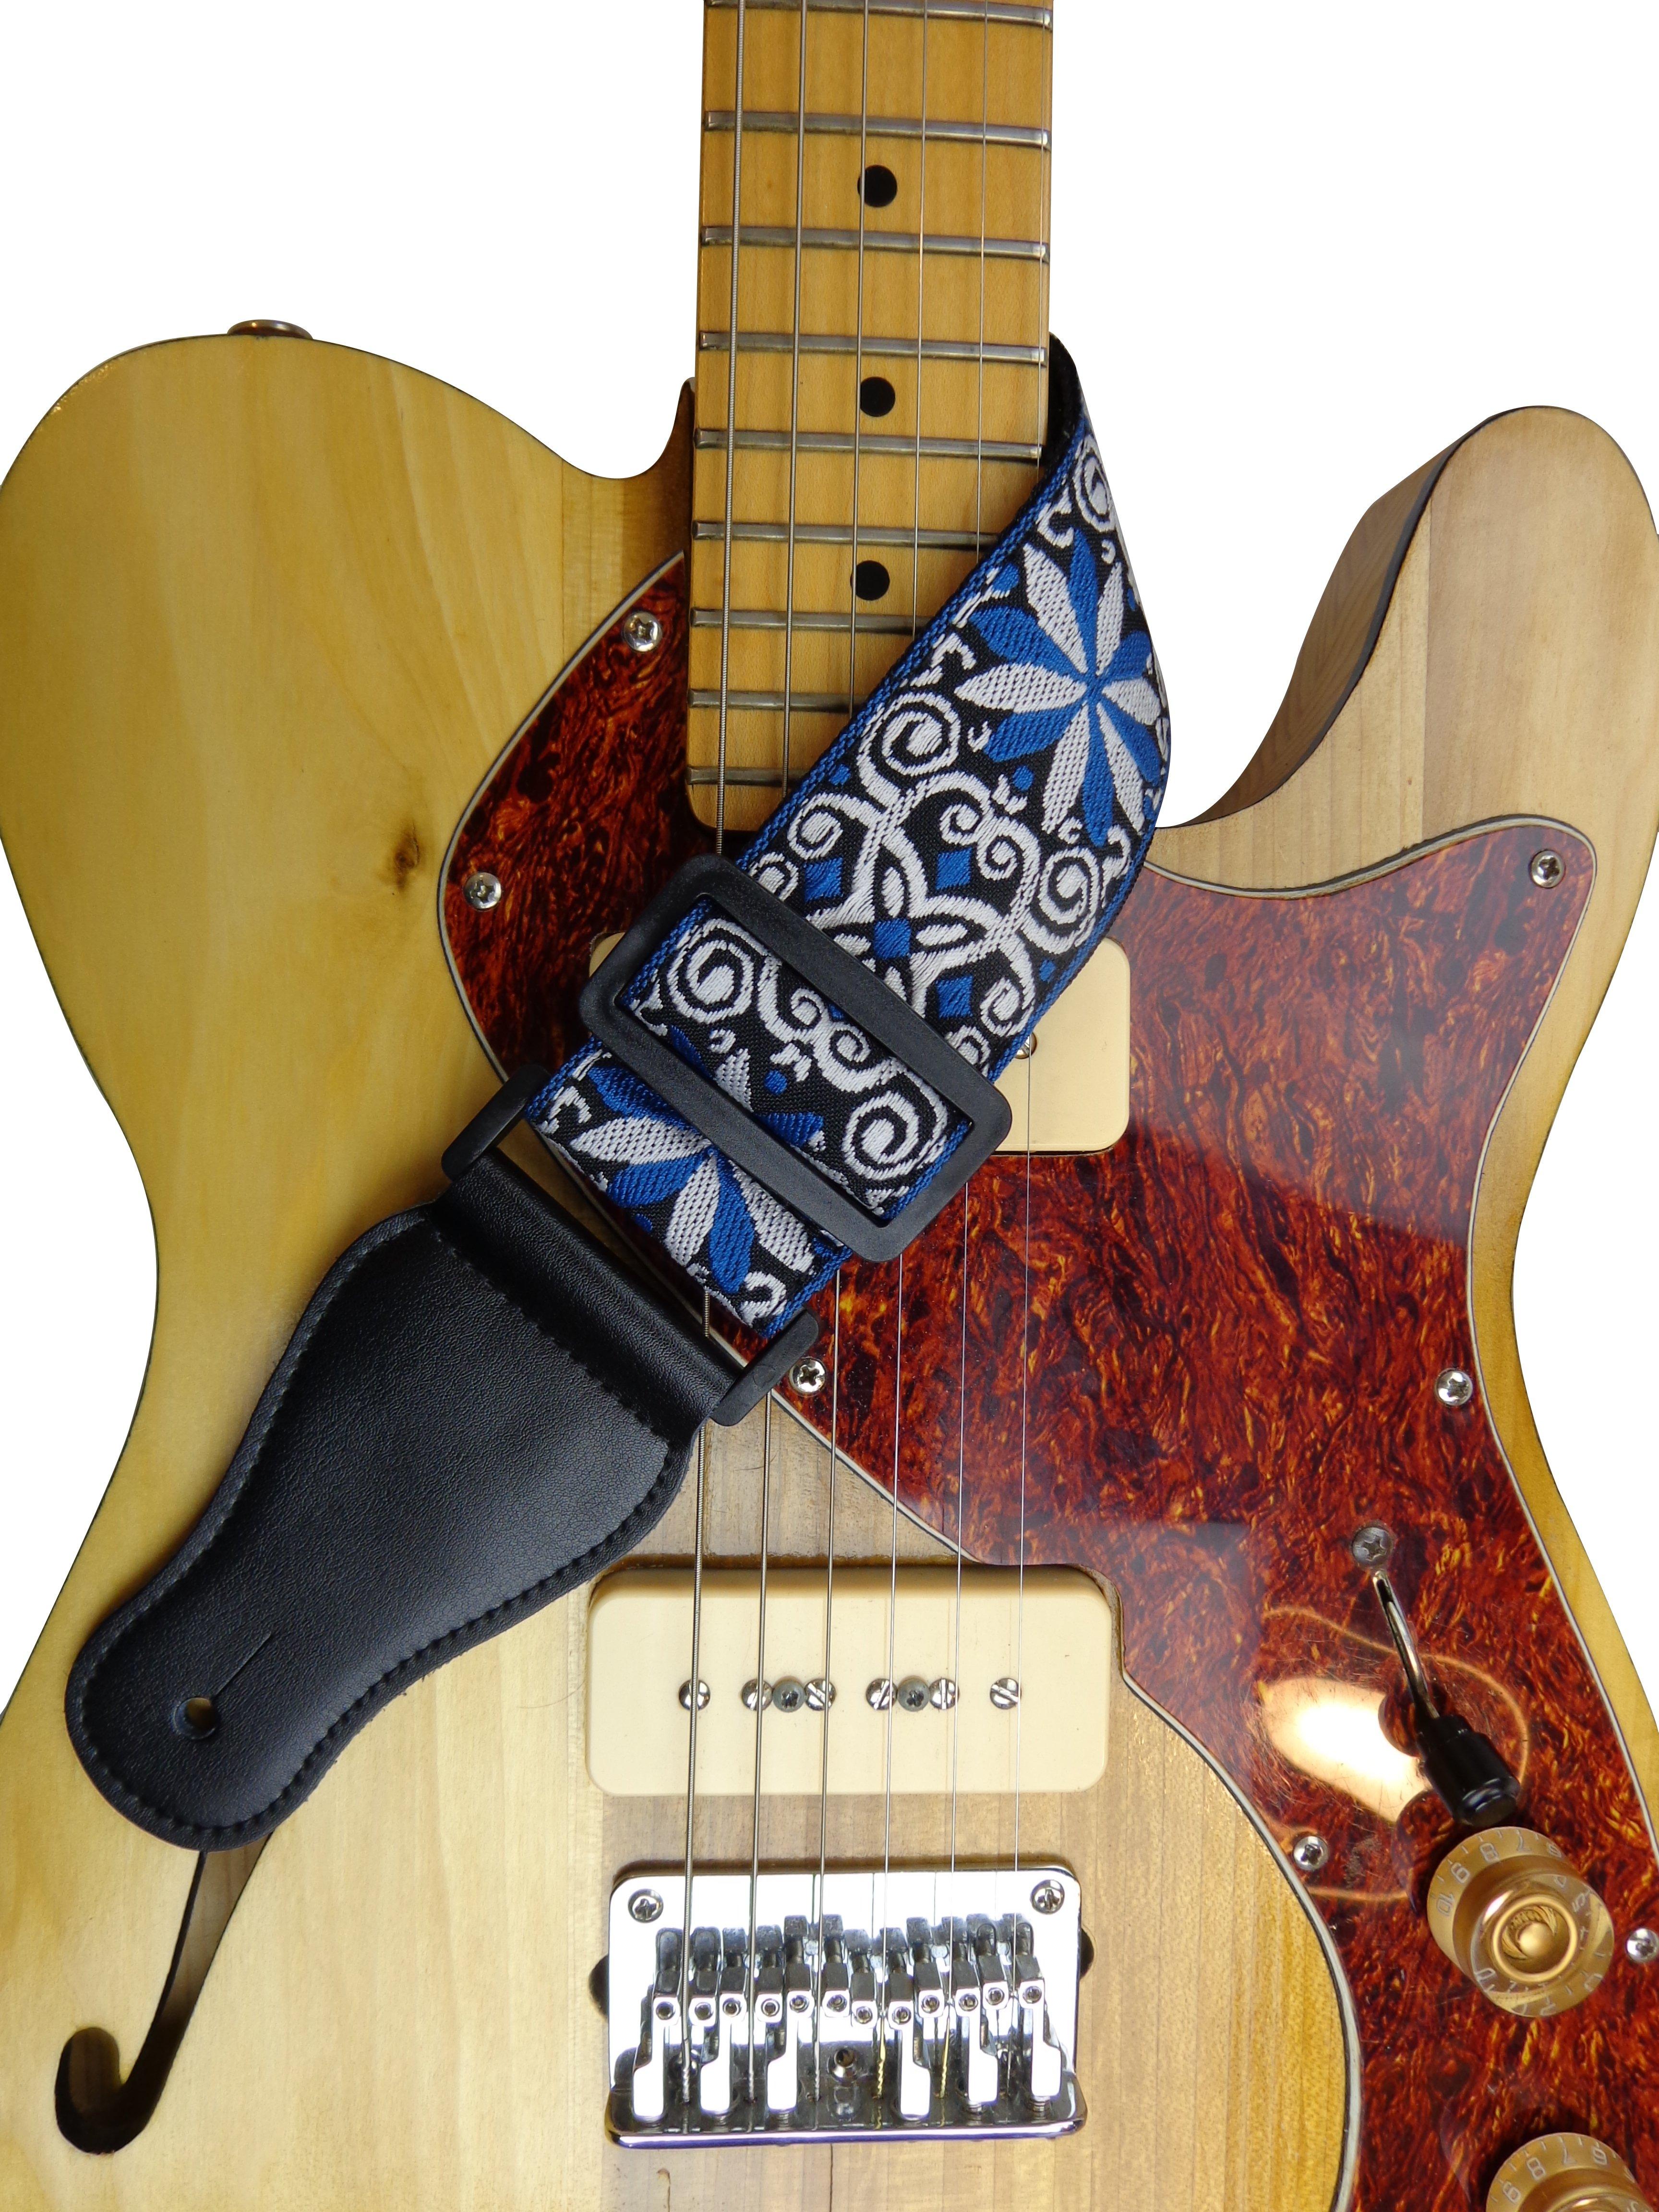 New-Retro-Vintage-Jacquard-Woven-Acoustic-Electric-Guitar-Strap thumbnail 3